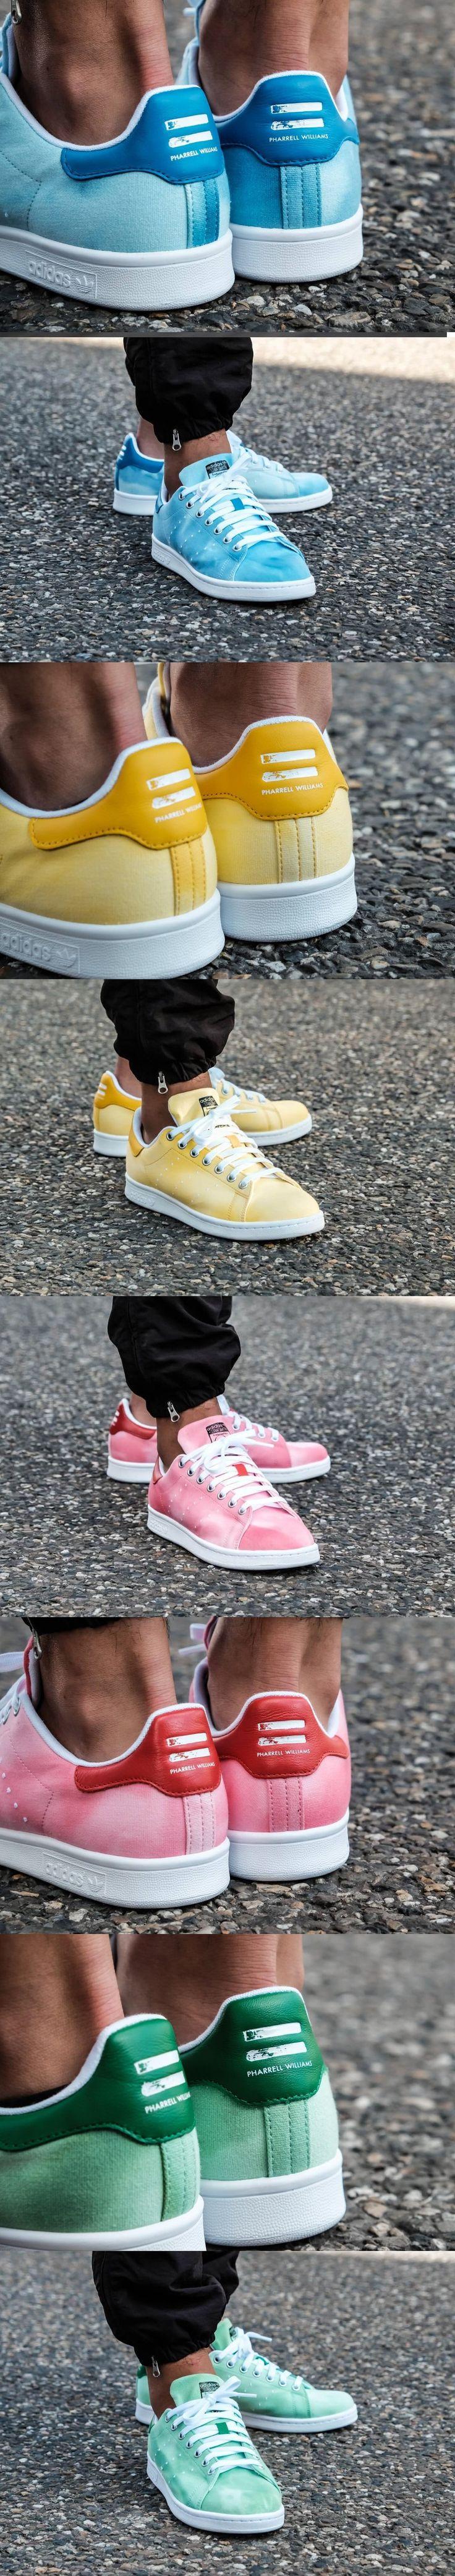 #Pharrell #Williams x #Adidas #Stan #Smith HU #Holi #Blue #yellow #pink #green